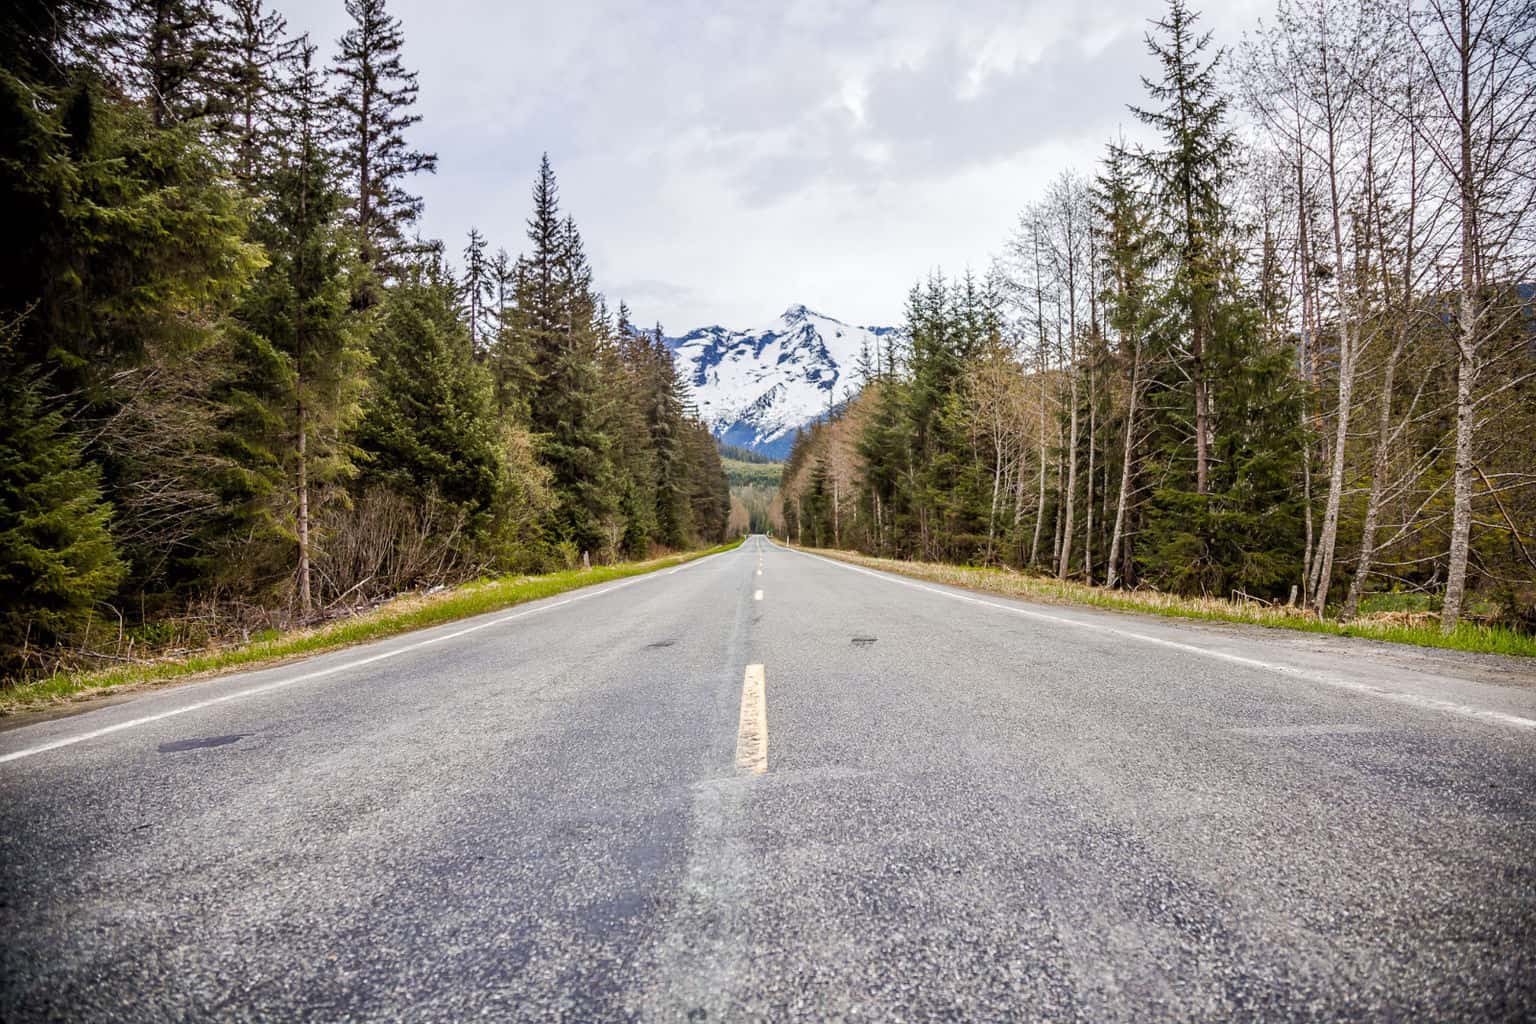 Alaska - Most roads are paved